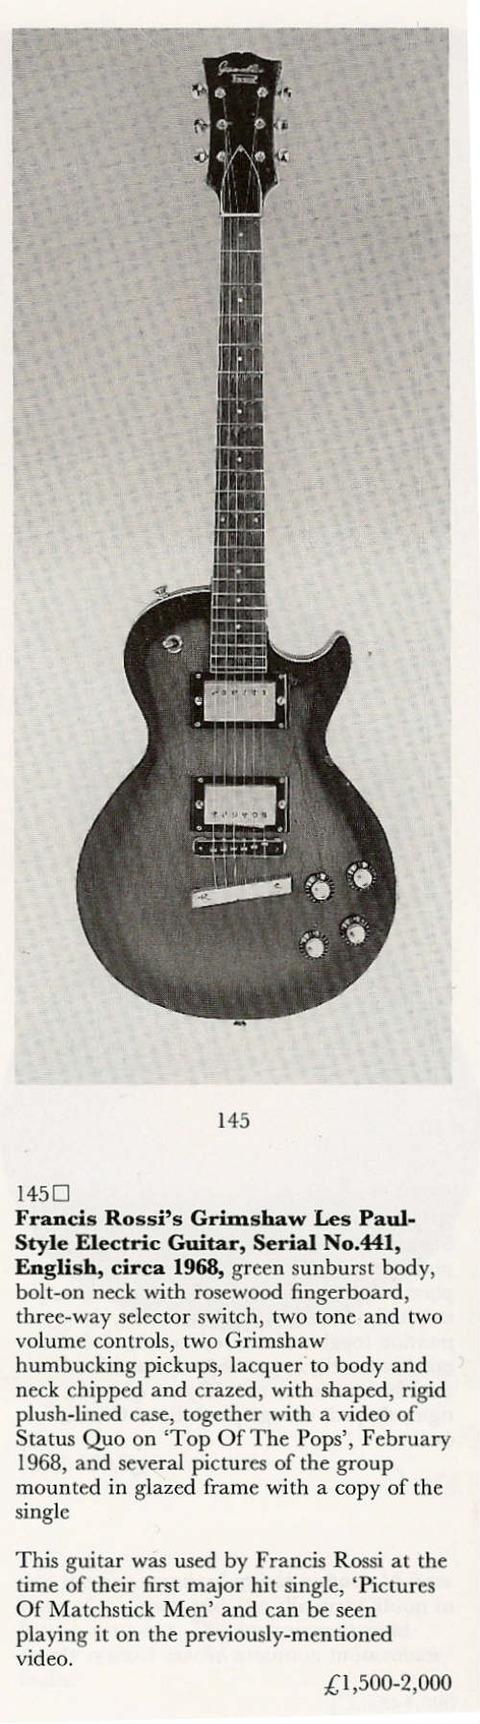 Francis Rossi's Grimshaw Guitar Serial #441